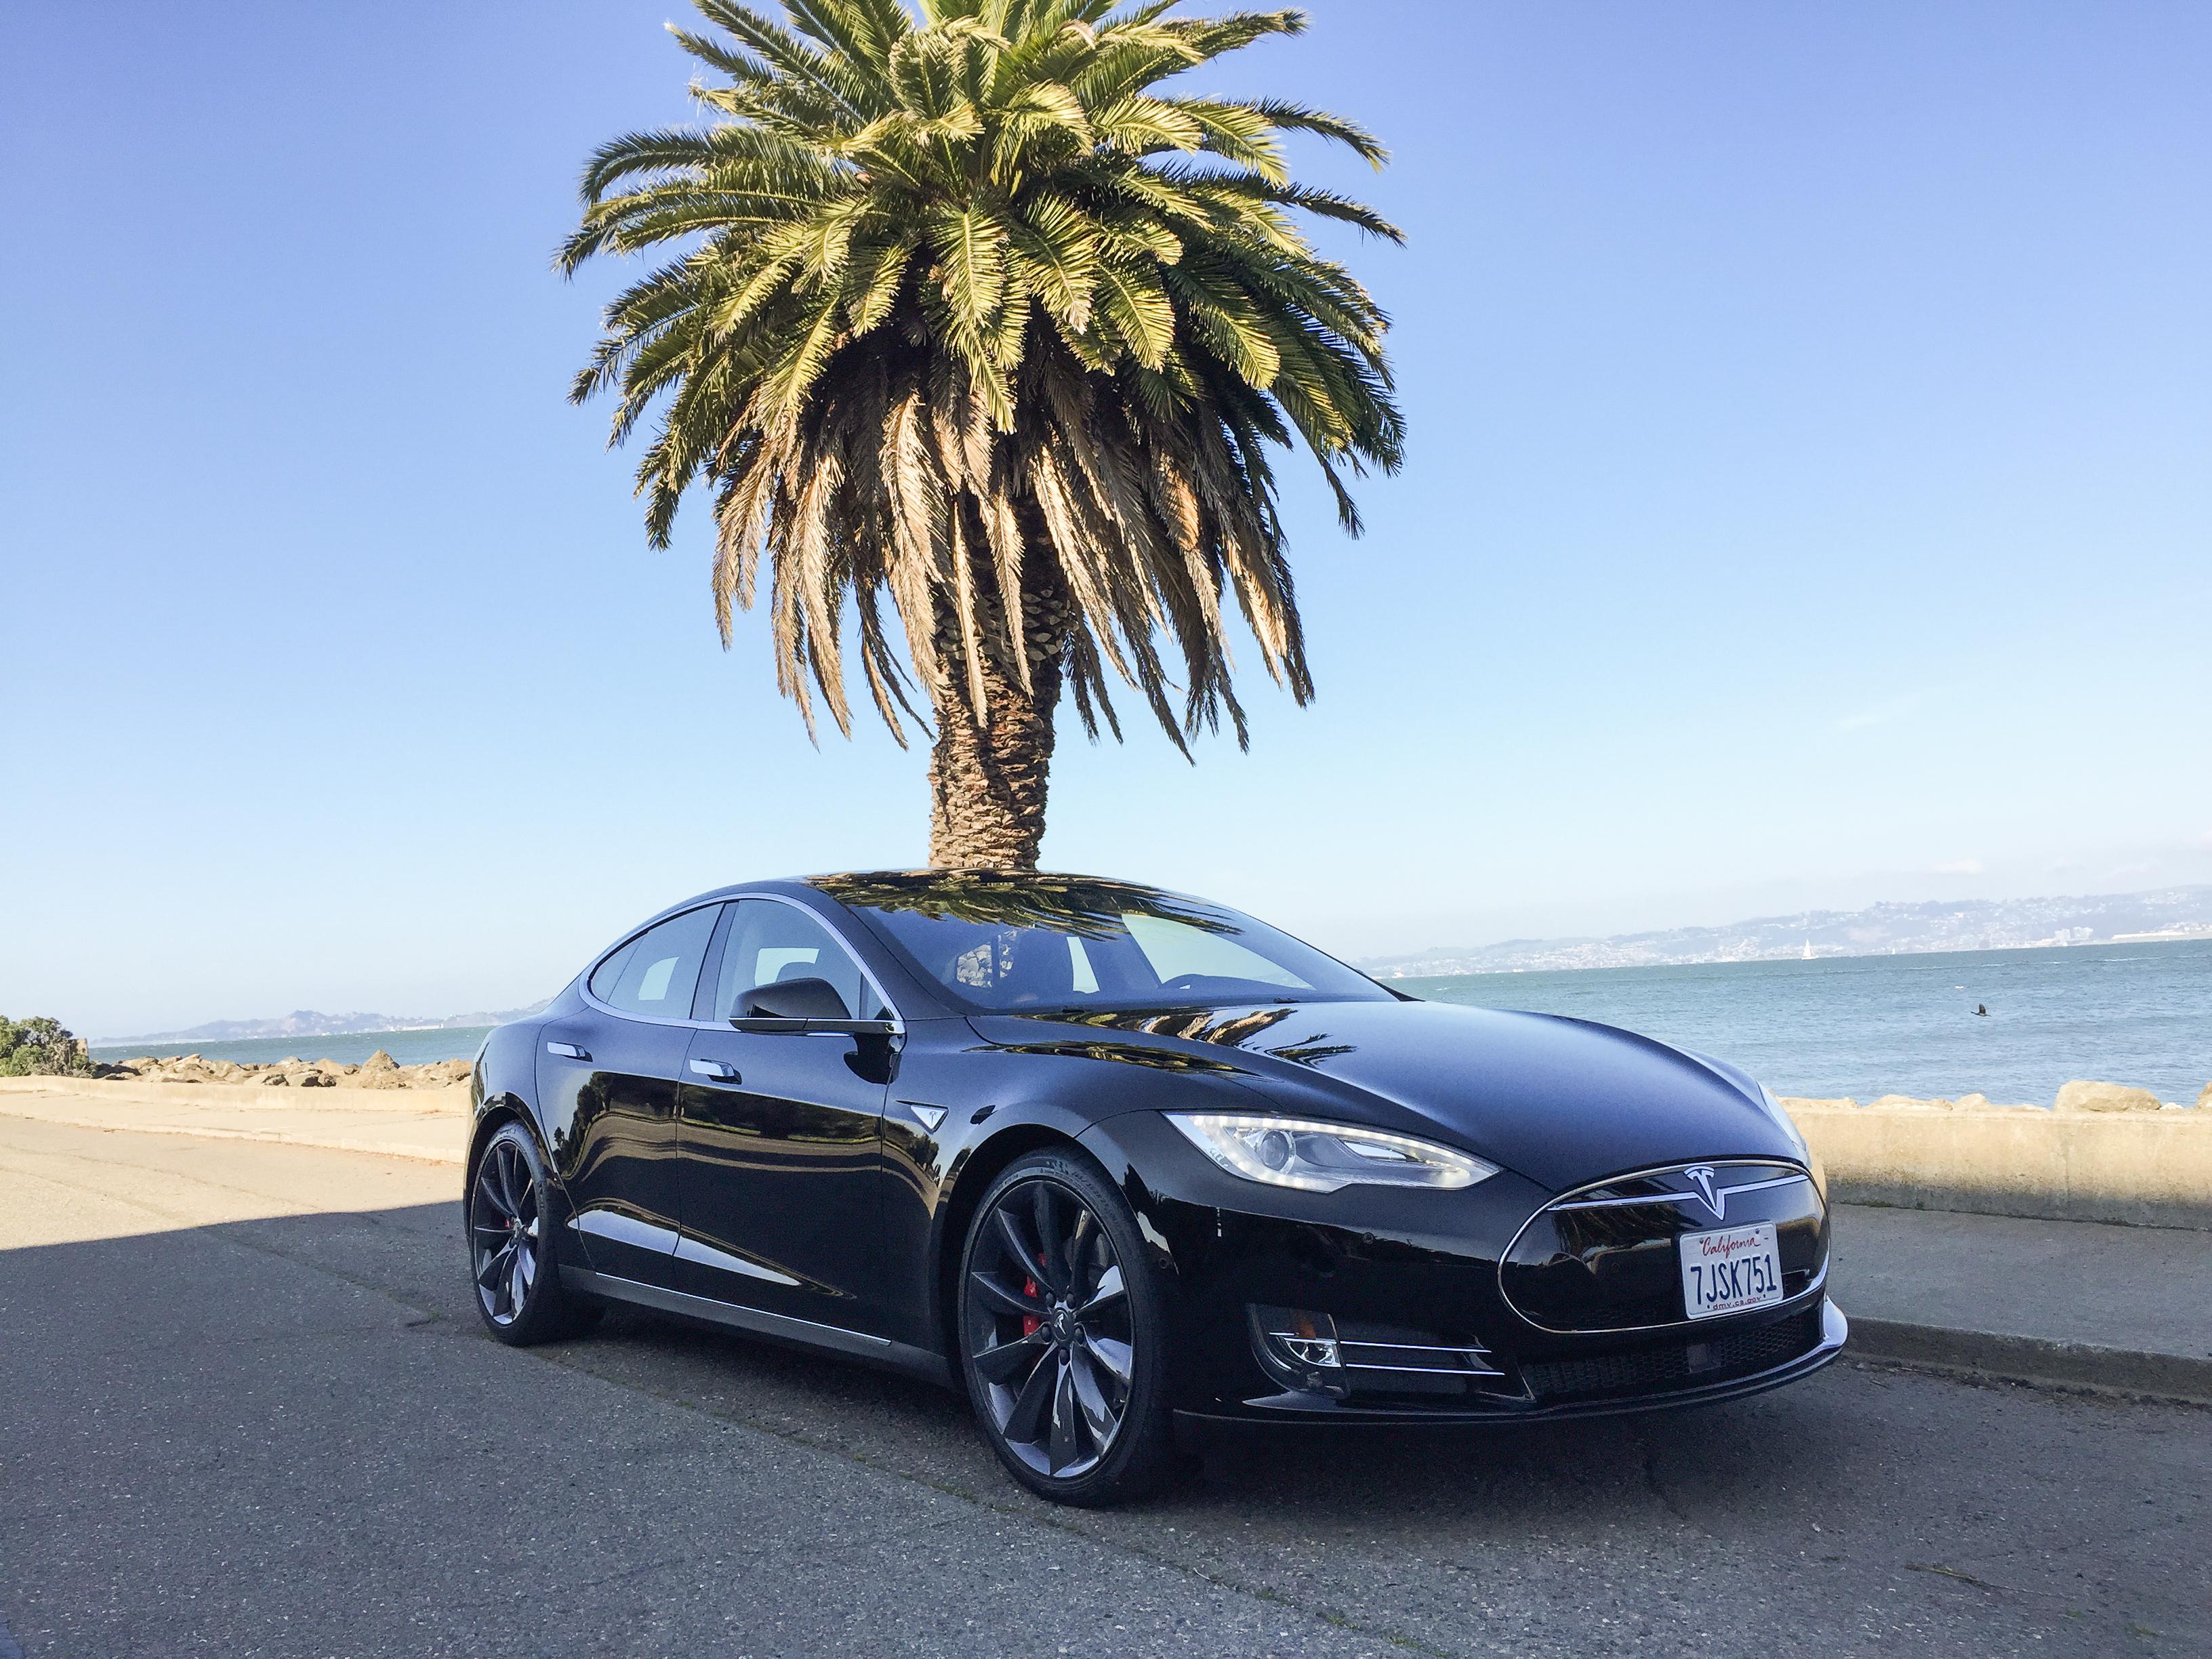 Rent a Black Tesla Model S in San Francisco Getaround